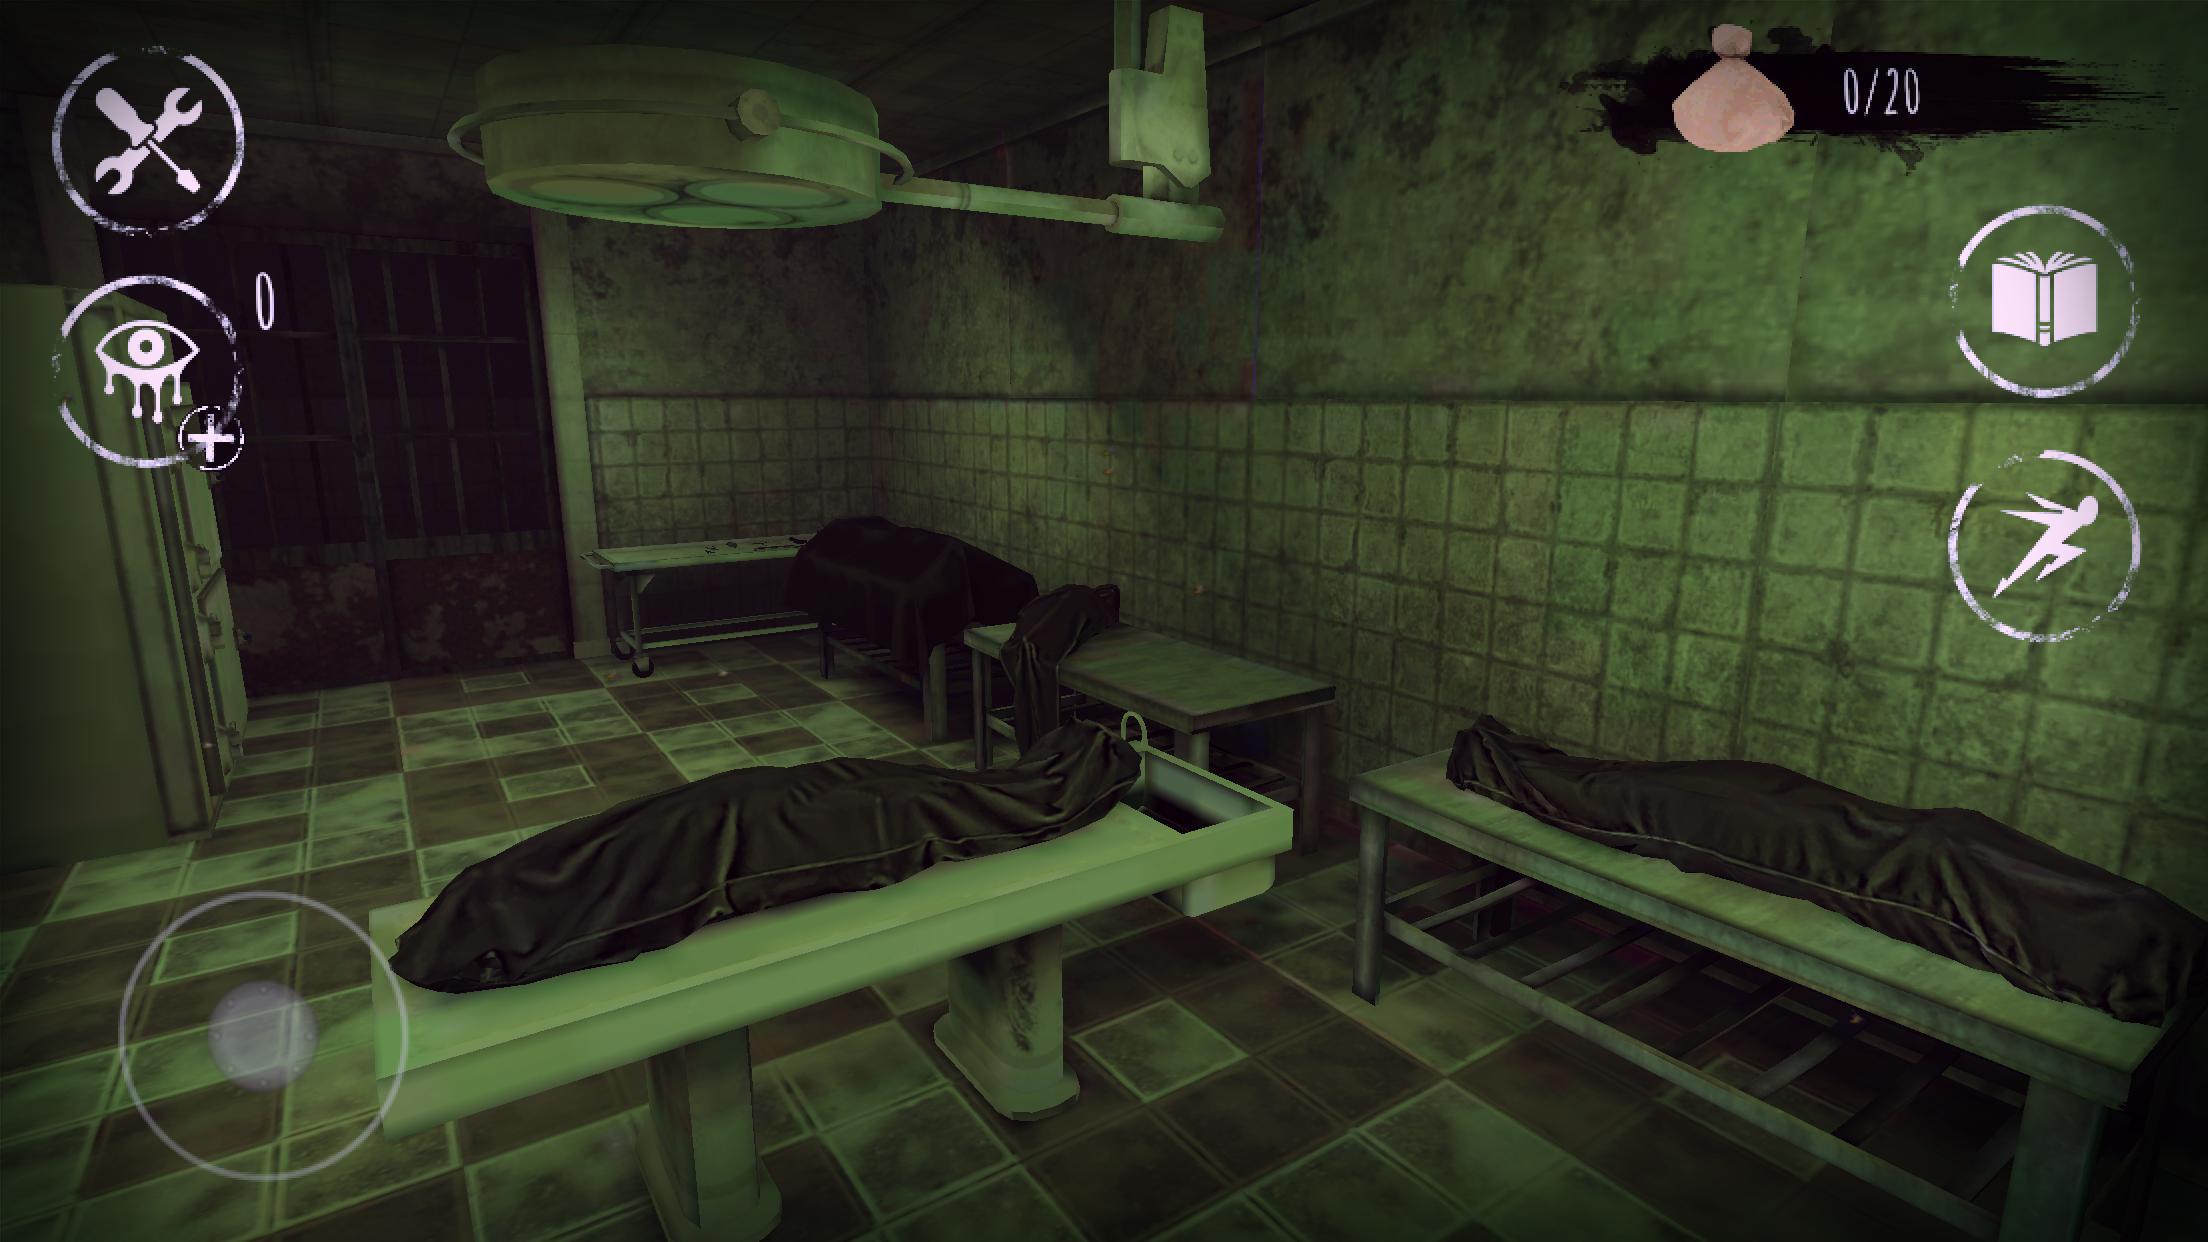 Eyes: Scary Thriller - Creepy Horror Game 6.1.21 Screenshot 9